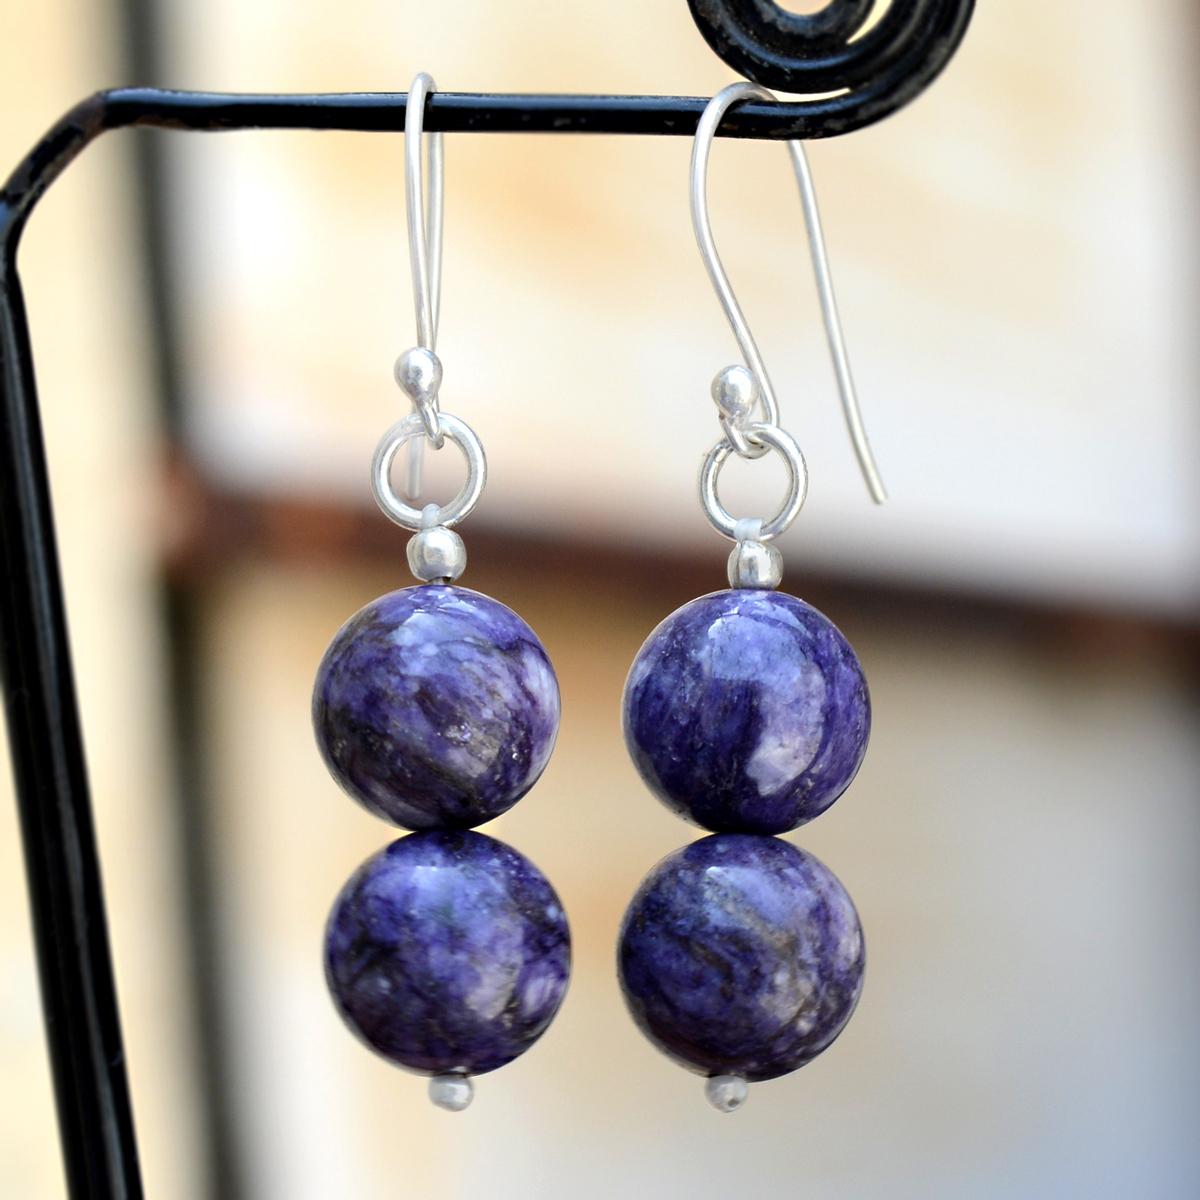 Purple Earring - Charoite Gemstone Jewelry - Handmade Manufacturer 925 Sterling Silver- Beaded Pierced Jaipur Rajasthan India